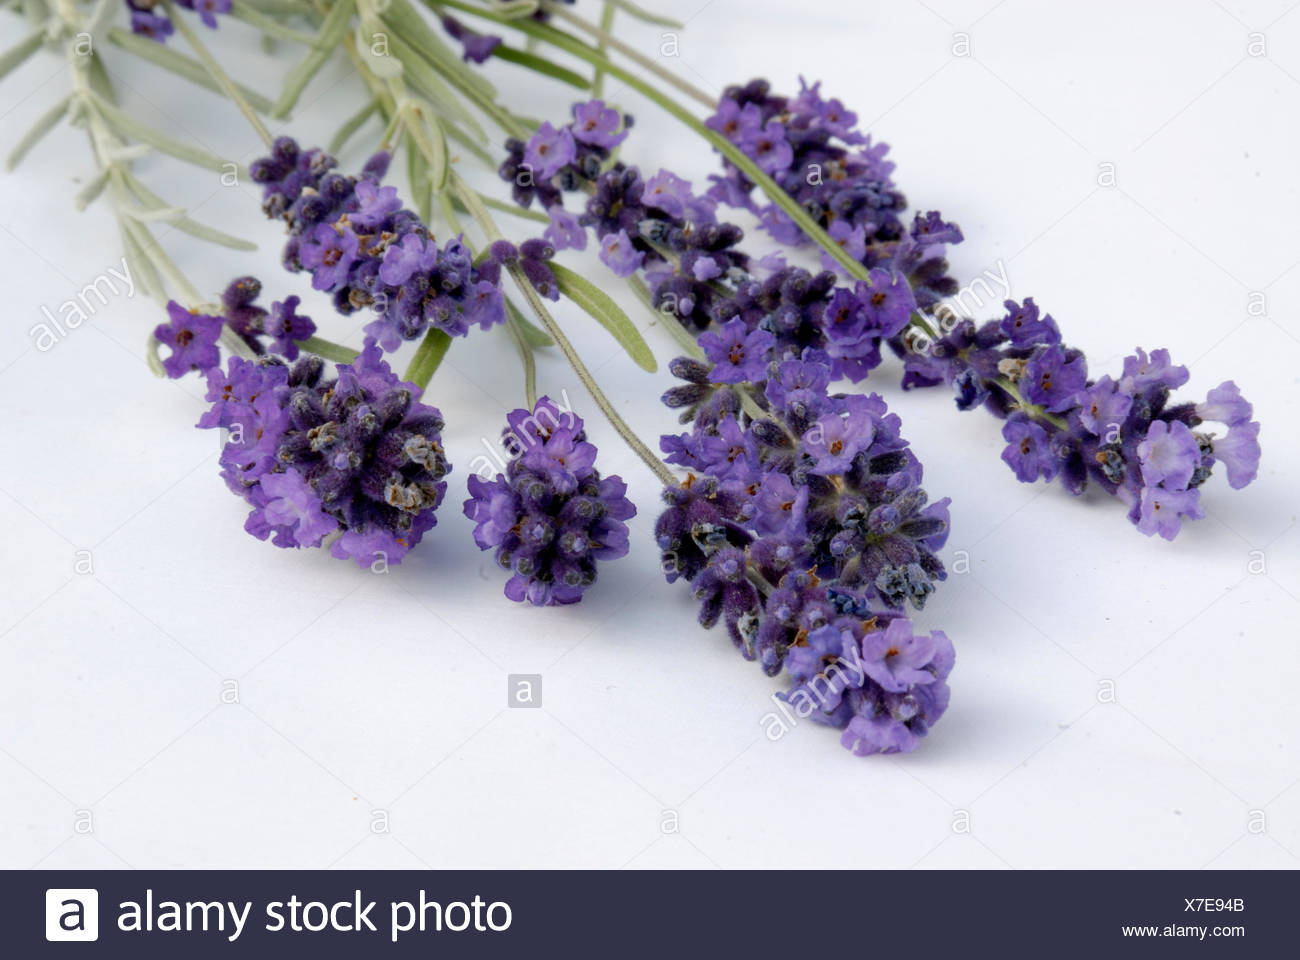 bloom blossom flourish flourishing violet lavender shrub cultigen blue optional Stock Photo